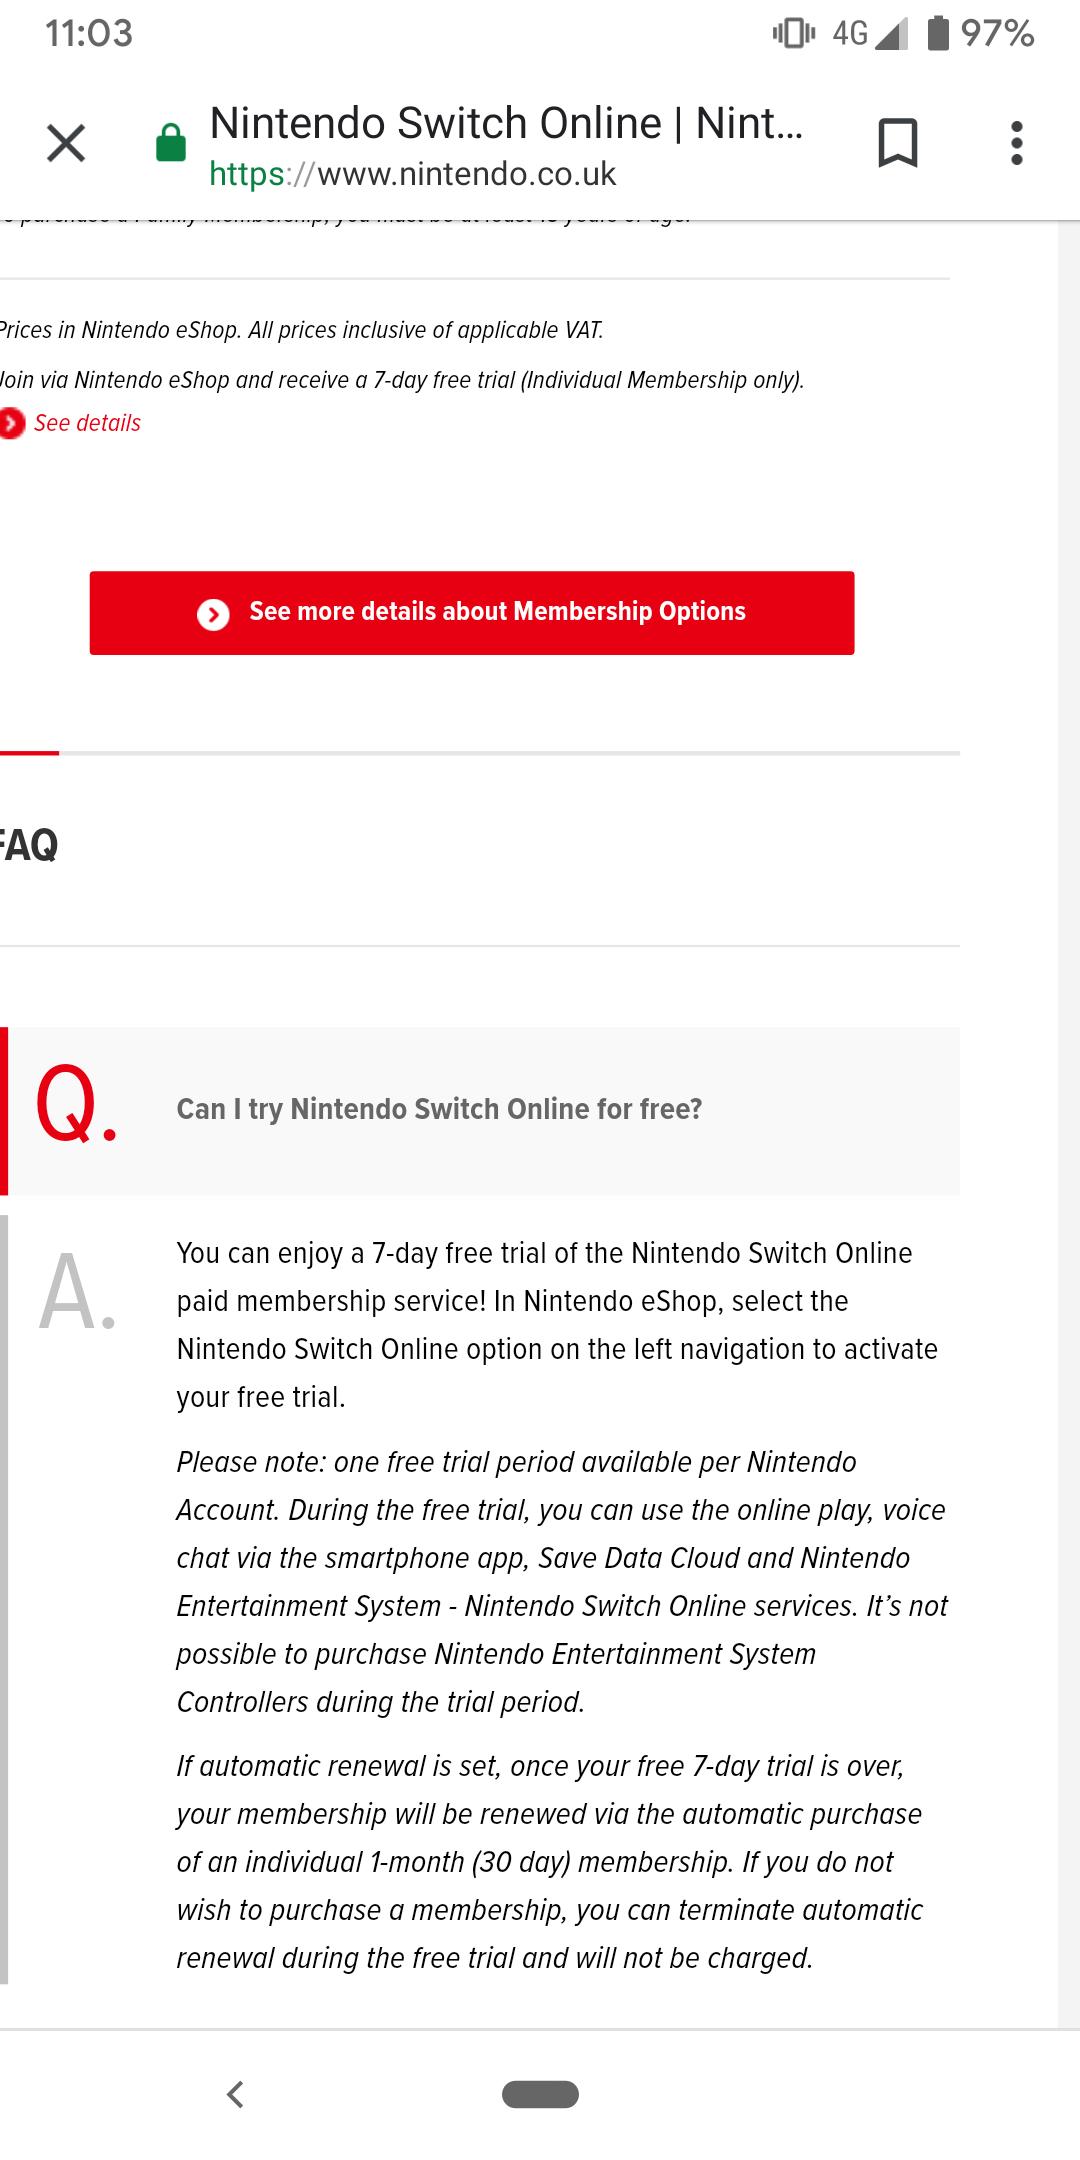 7 days FREE trial of Nintendo Switch Online @ Nintendo